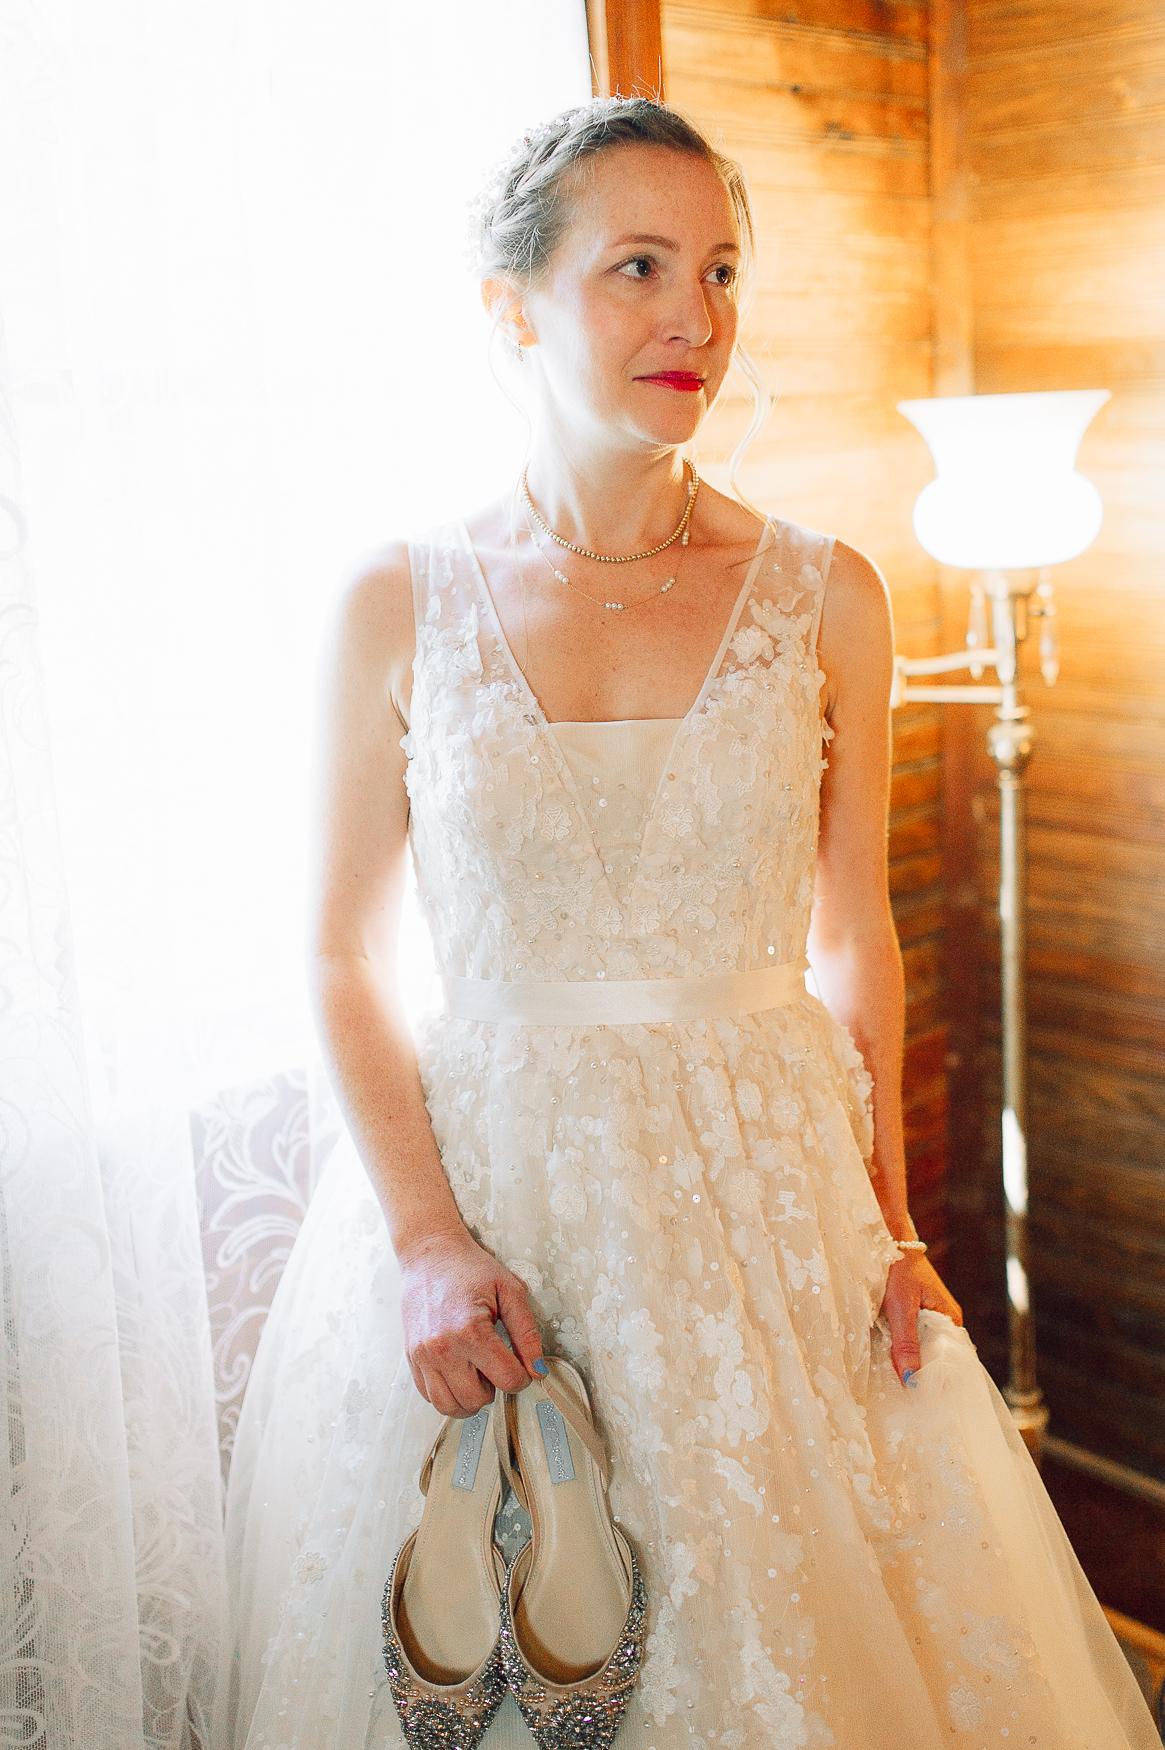 virginiawedding_theGlasgowFarm_rusticwedding_fredericksburg_youseephotography_CarolineDale (19).jpg